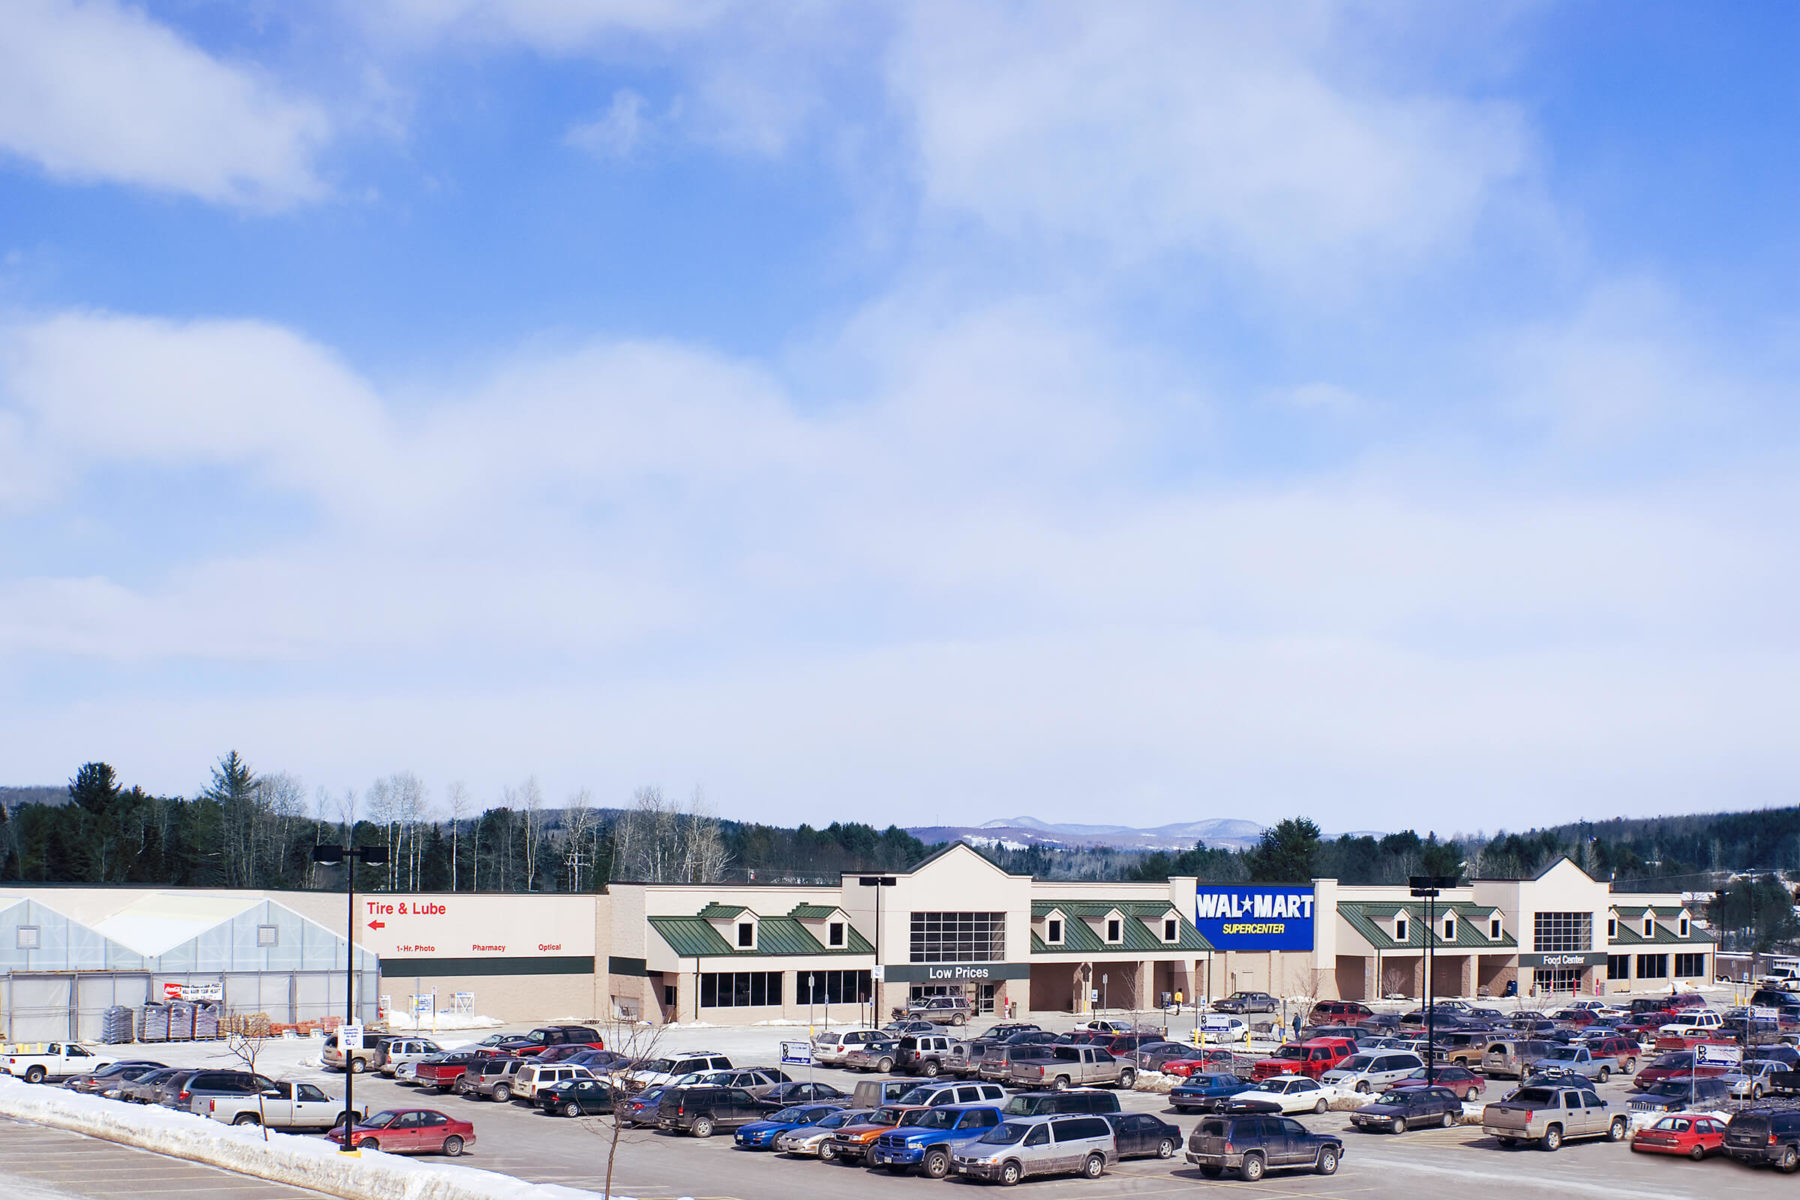 Walmart Plaza Farmington Ws Development